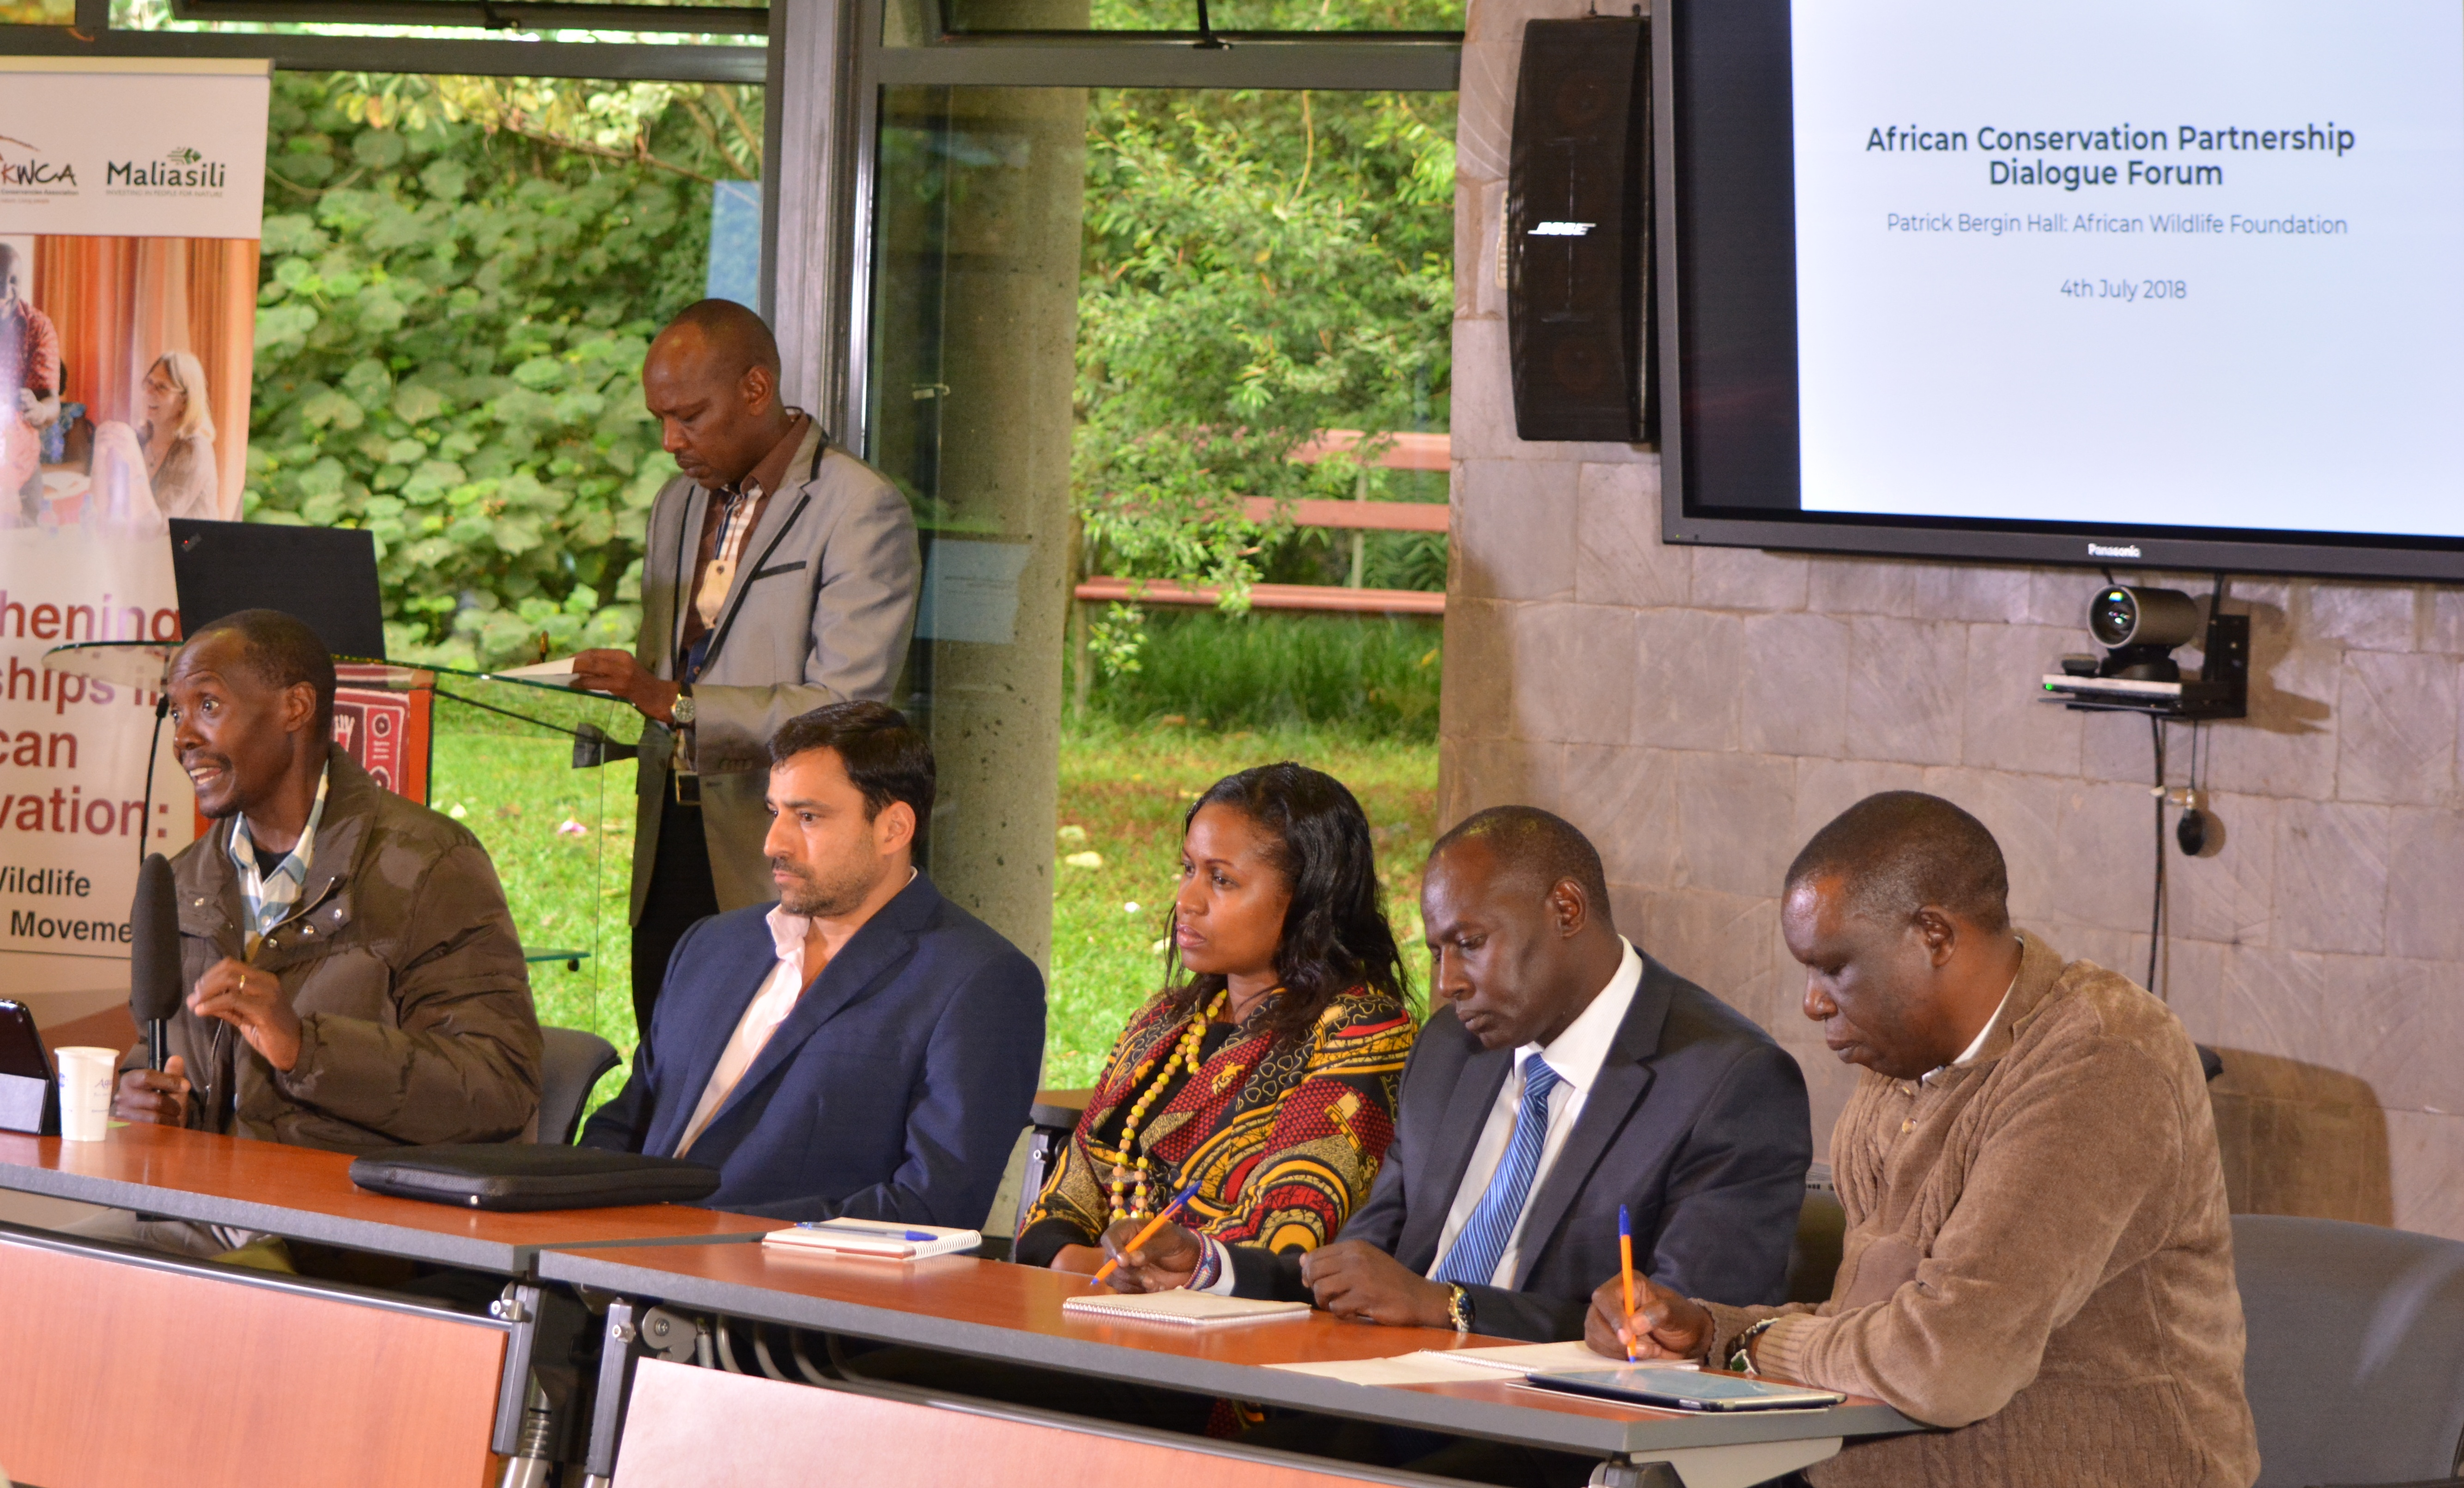 Partnership dialogue participant_July2018 Nairobi